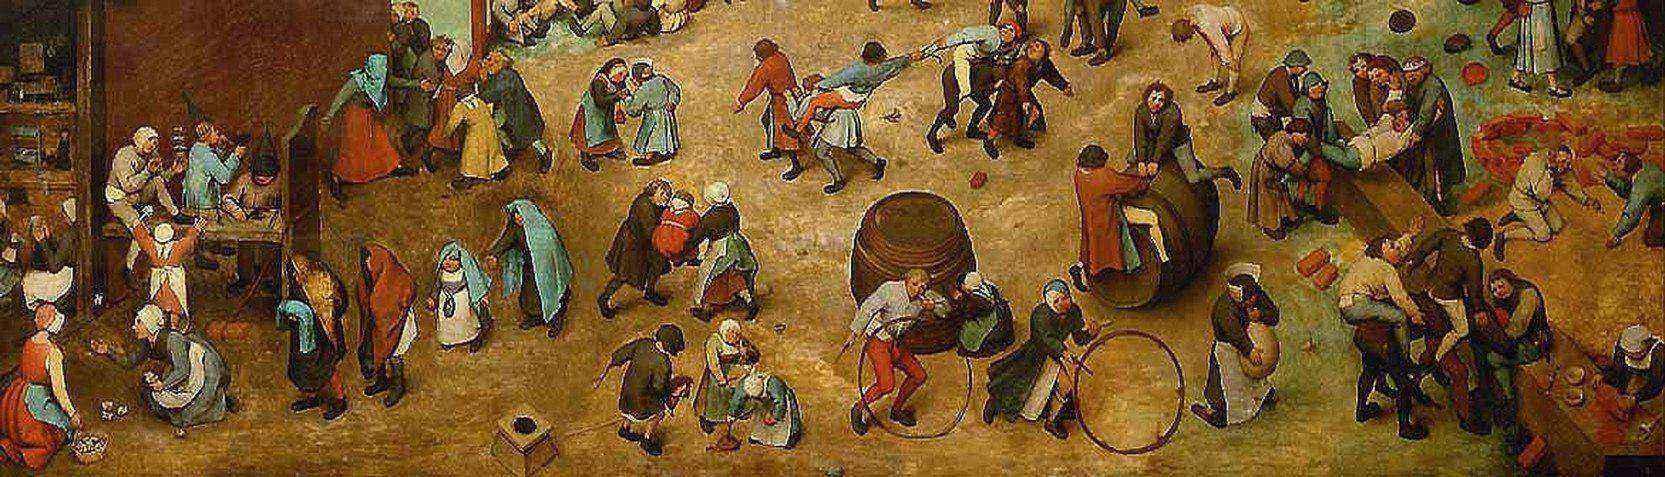 Artyści - Pieter Bruegel der Ältere